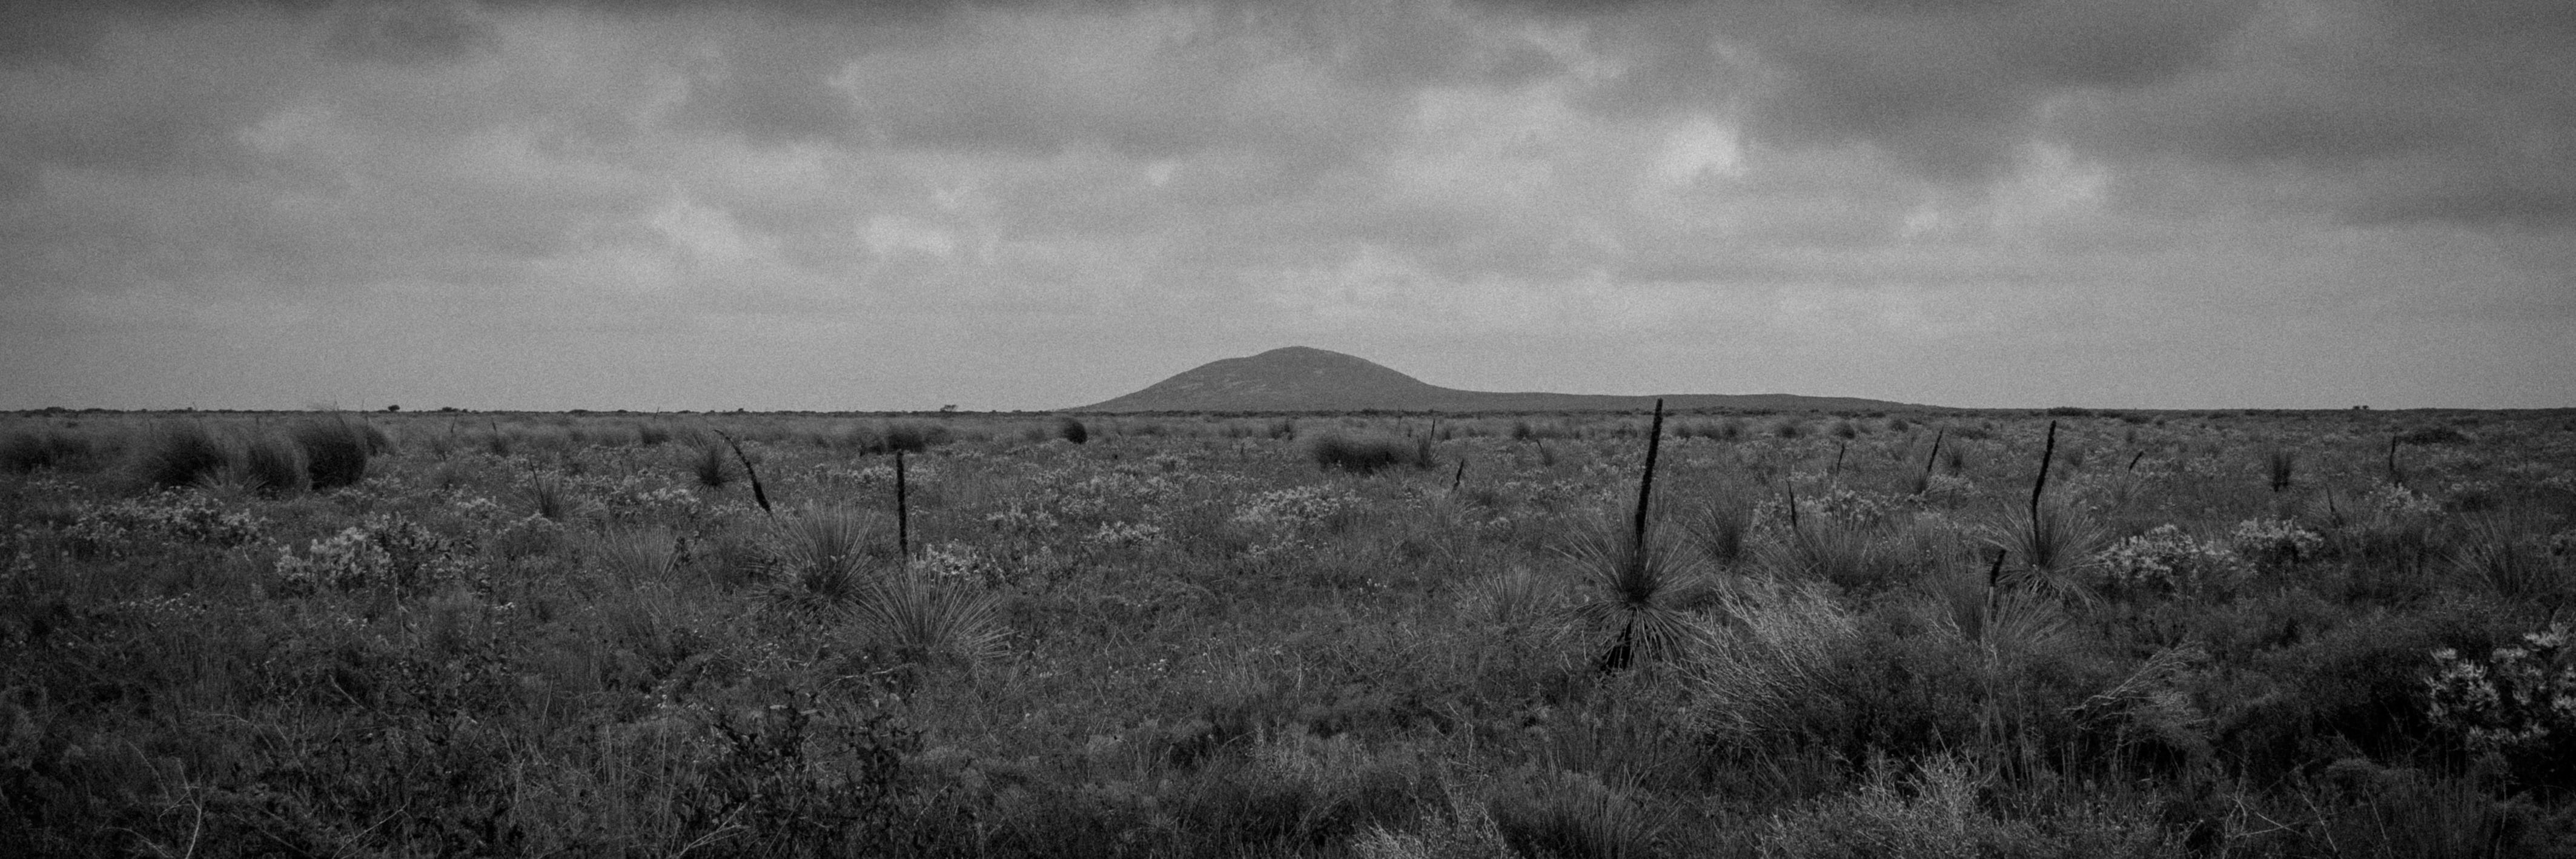 Documentary photography essay